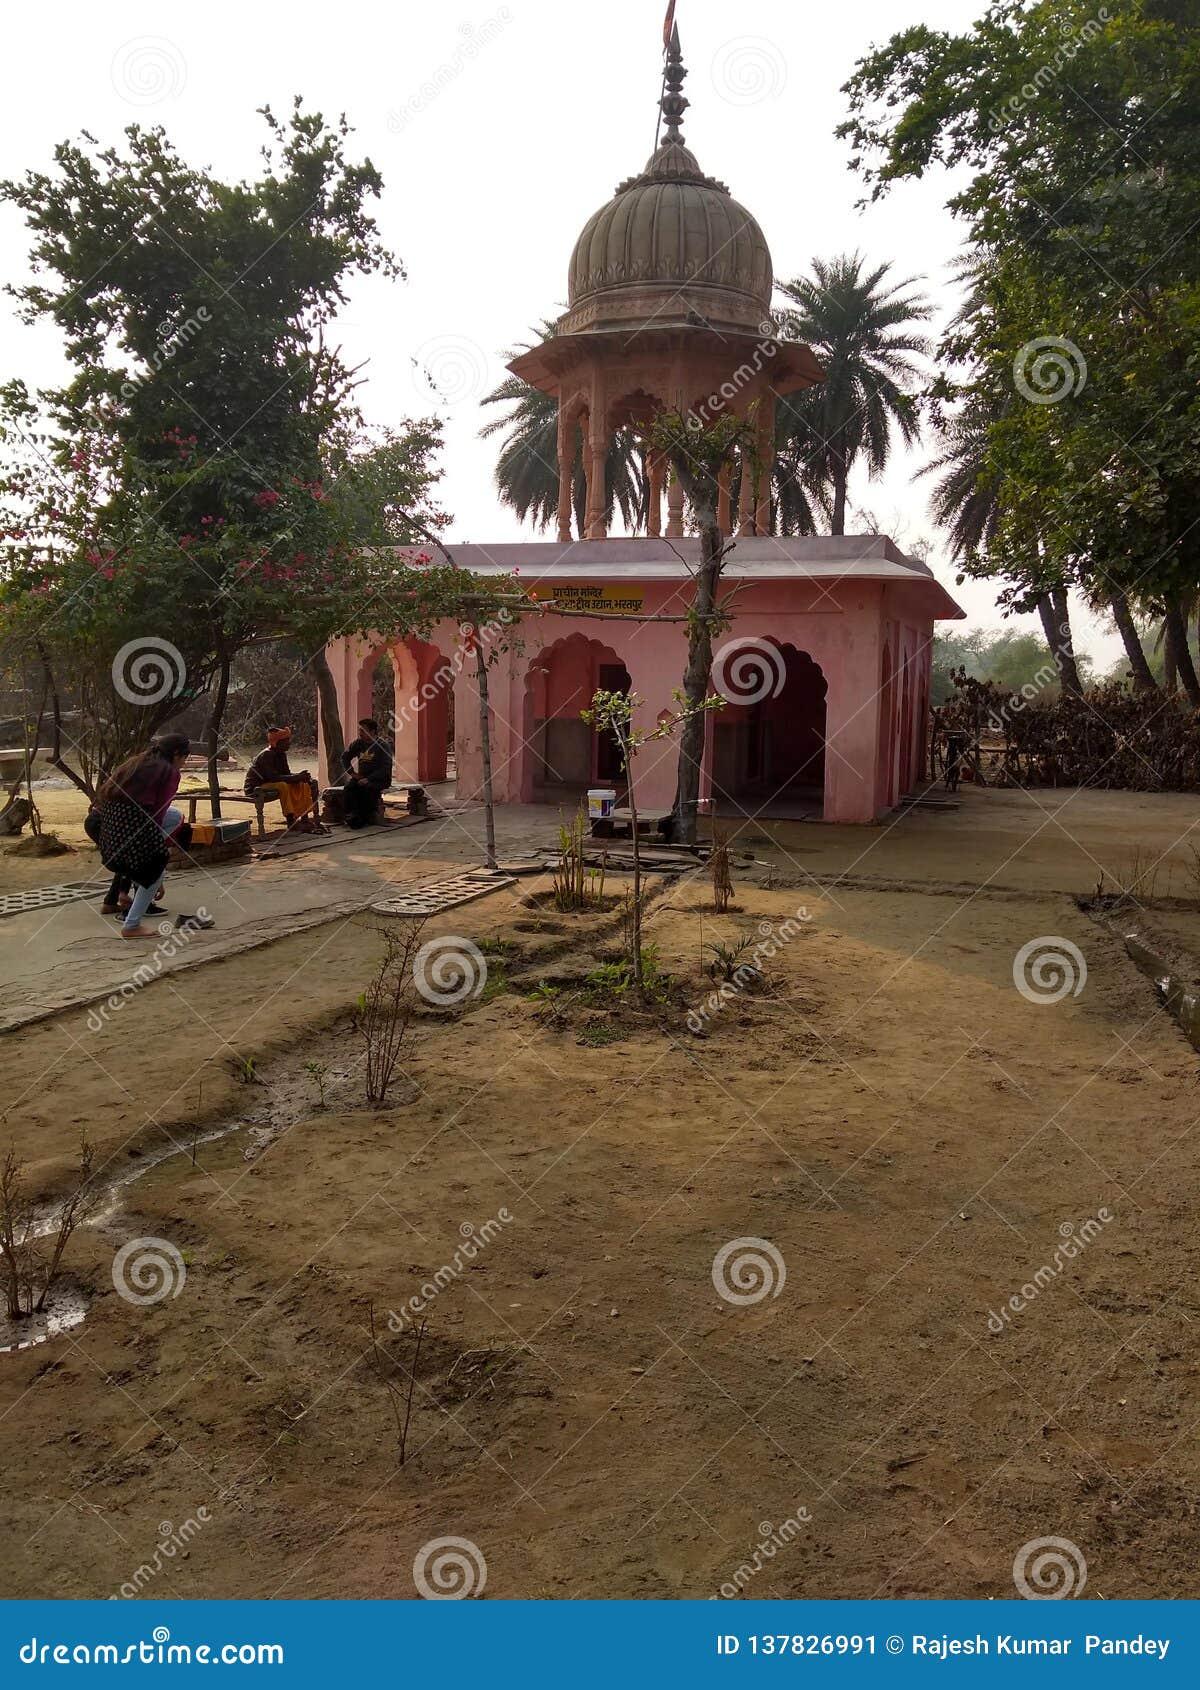 Lord keoladev Shiv-Tempel, Nationalpark Bharatpur Rajasthan Indien Keloadev